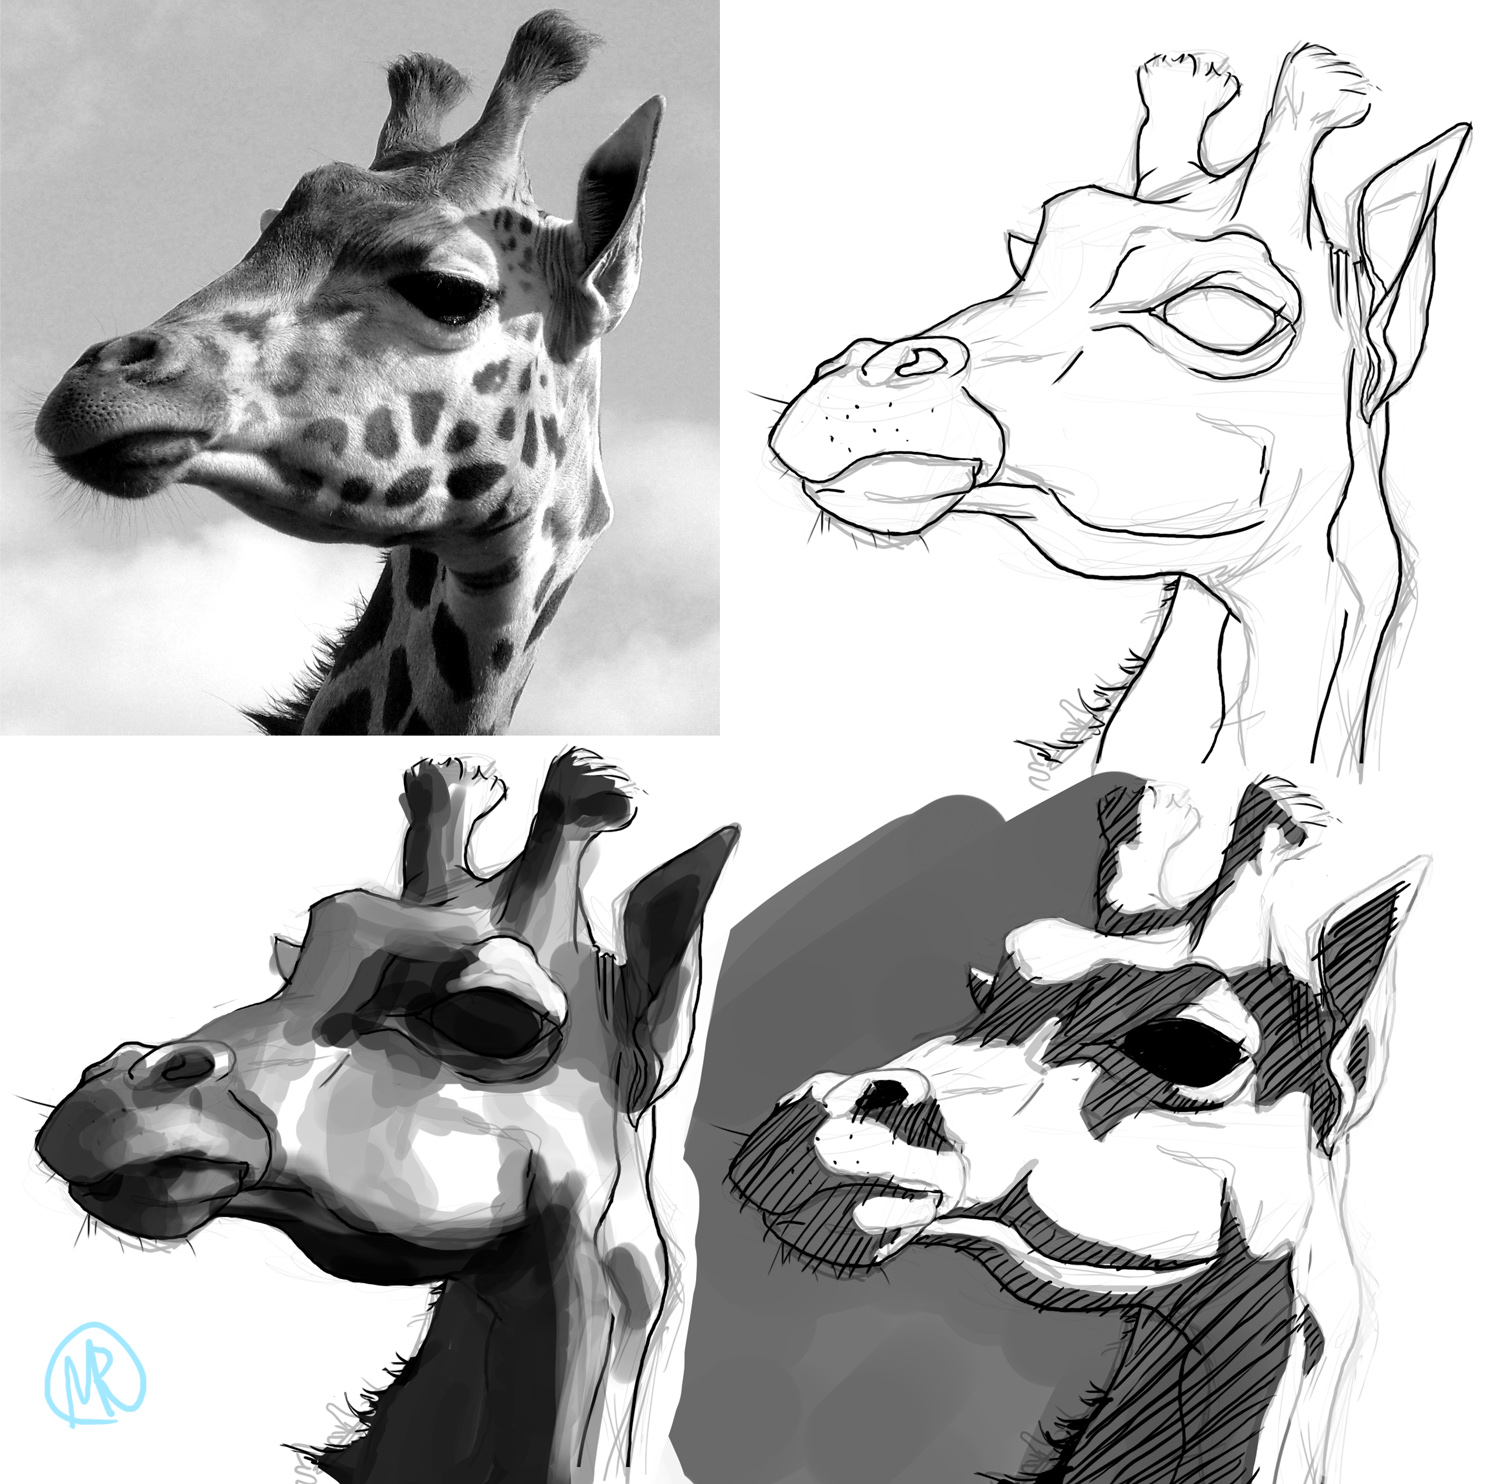 Giraffe Face Pencil Drawing - photo#34